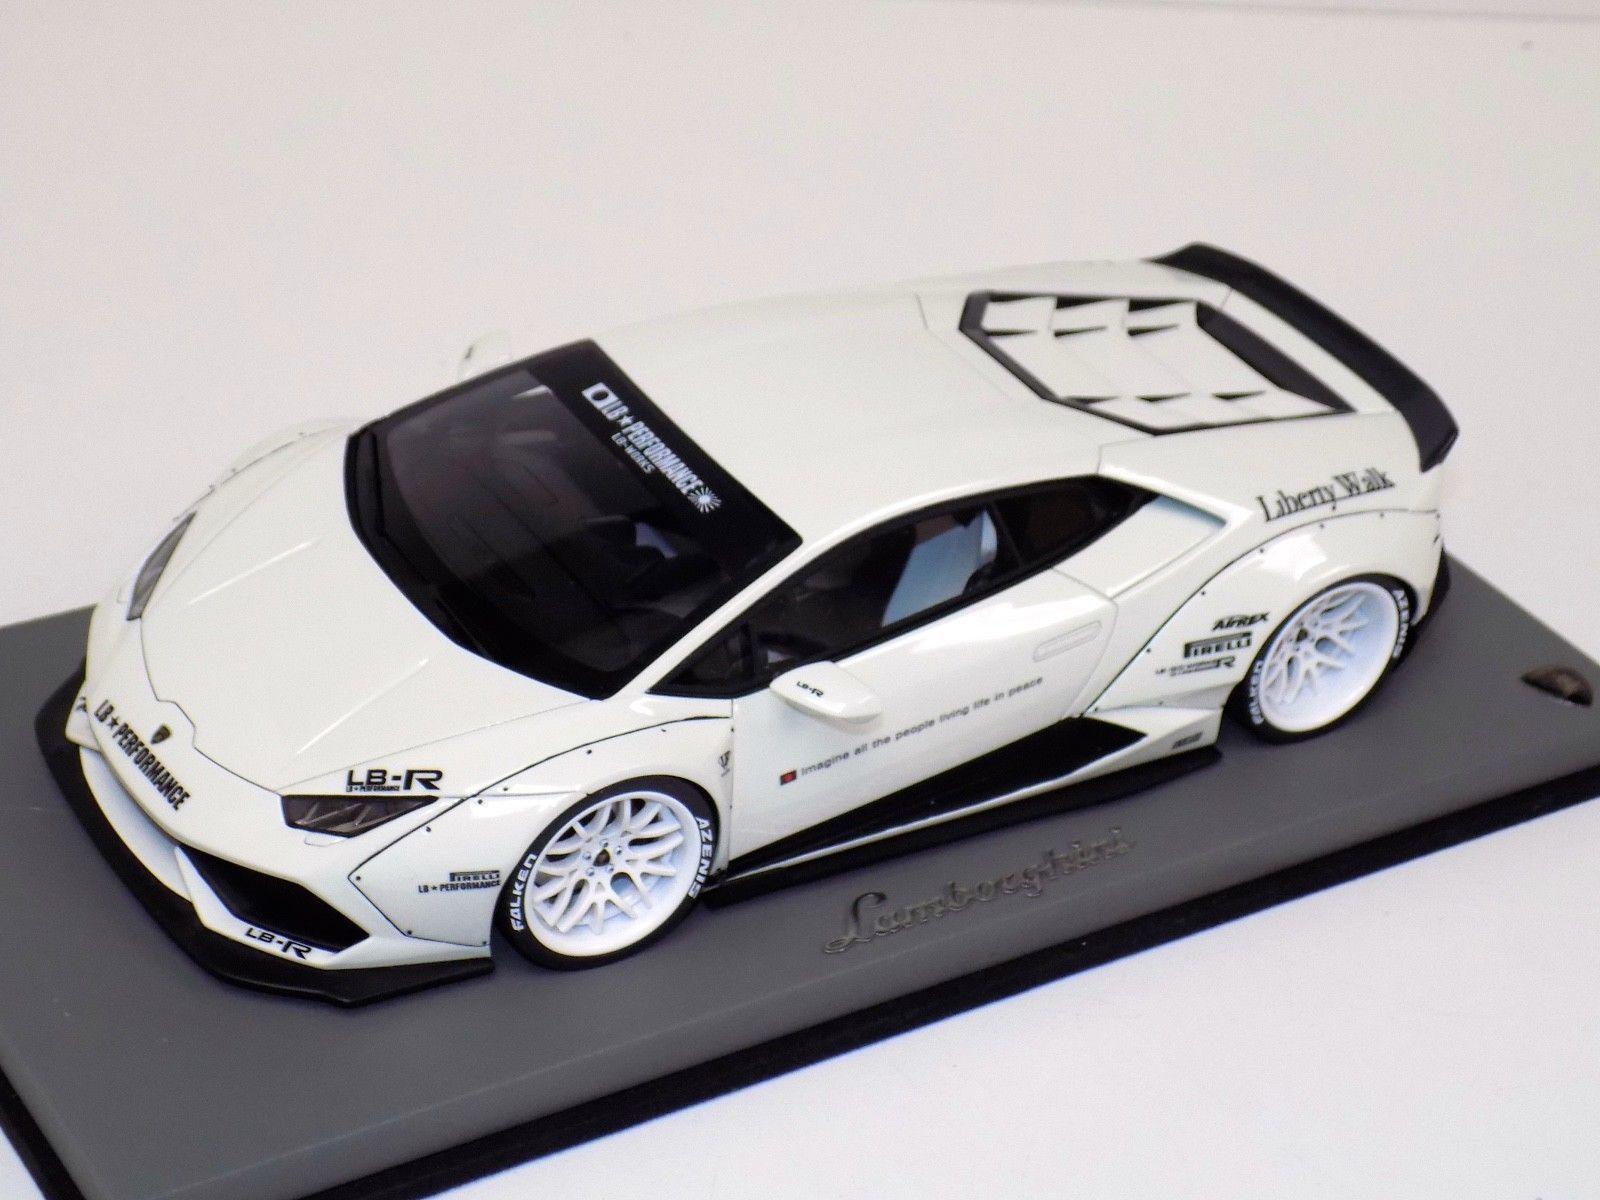 a6157864f24a9525e2a80da2680f2bed Marvelous Lamborghini Huracan Hack asphalt 8 Cars Trend